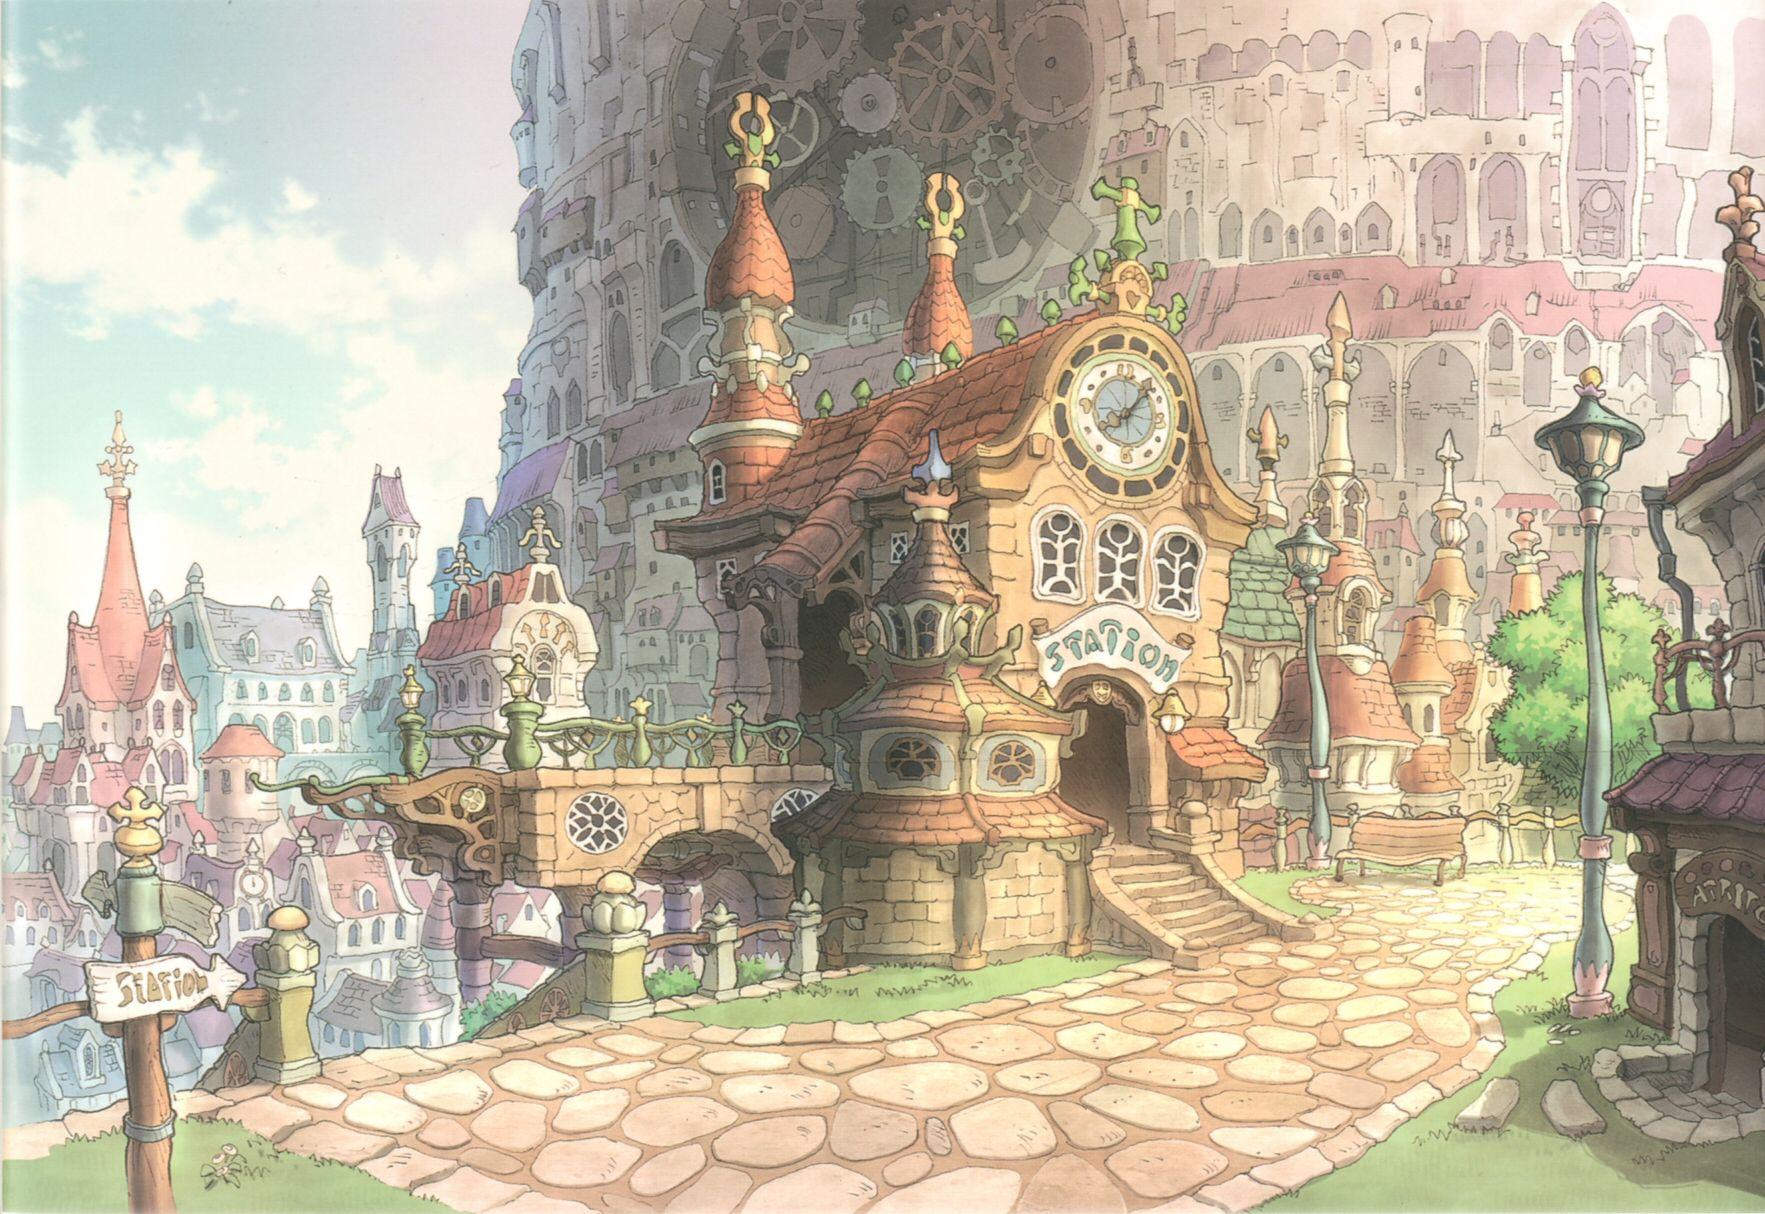 Lindblum Final Fantasy Ix From Ff Omeganebula Com Environment Concept Art Fantasy Concept Art Fantasy Landscape